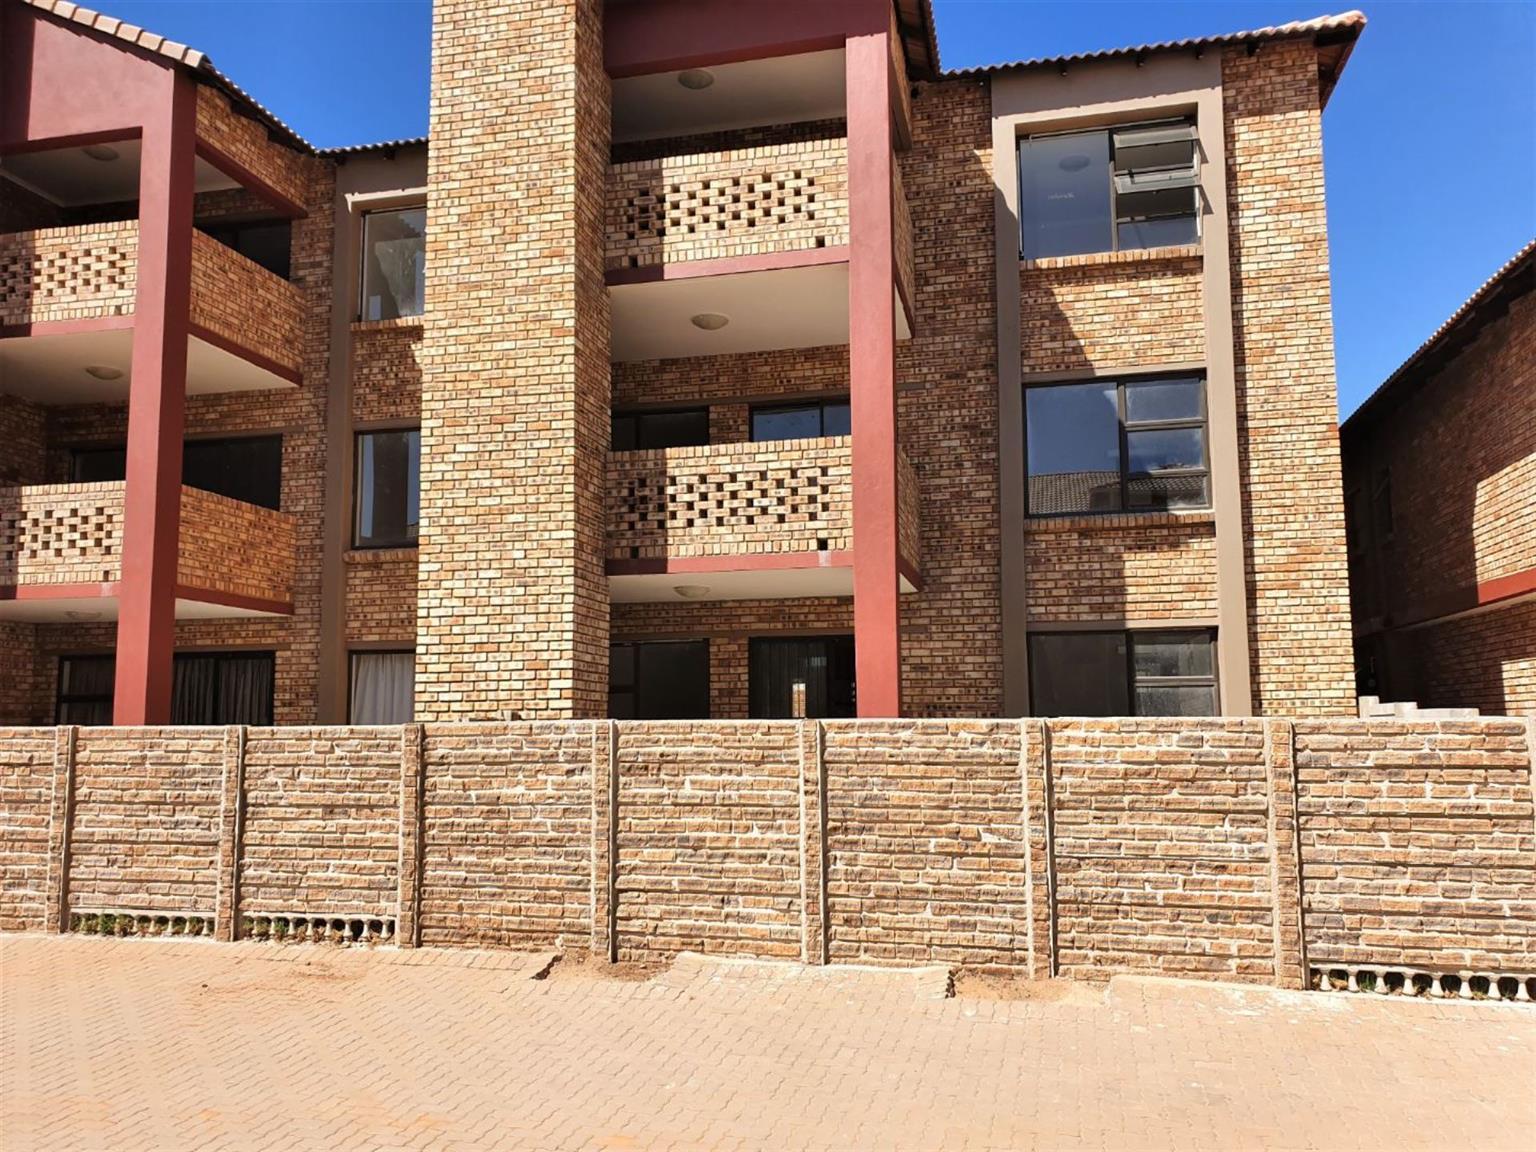 Townhouse Rental Monthly in RASLOUW